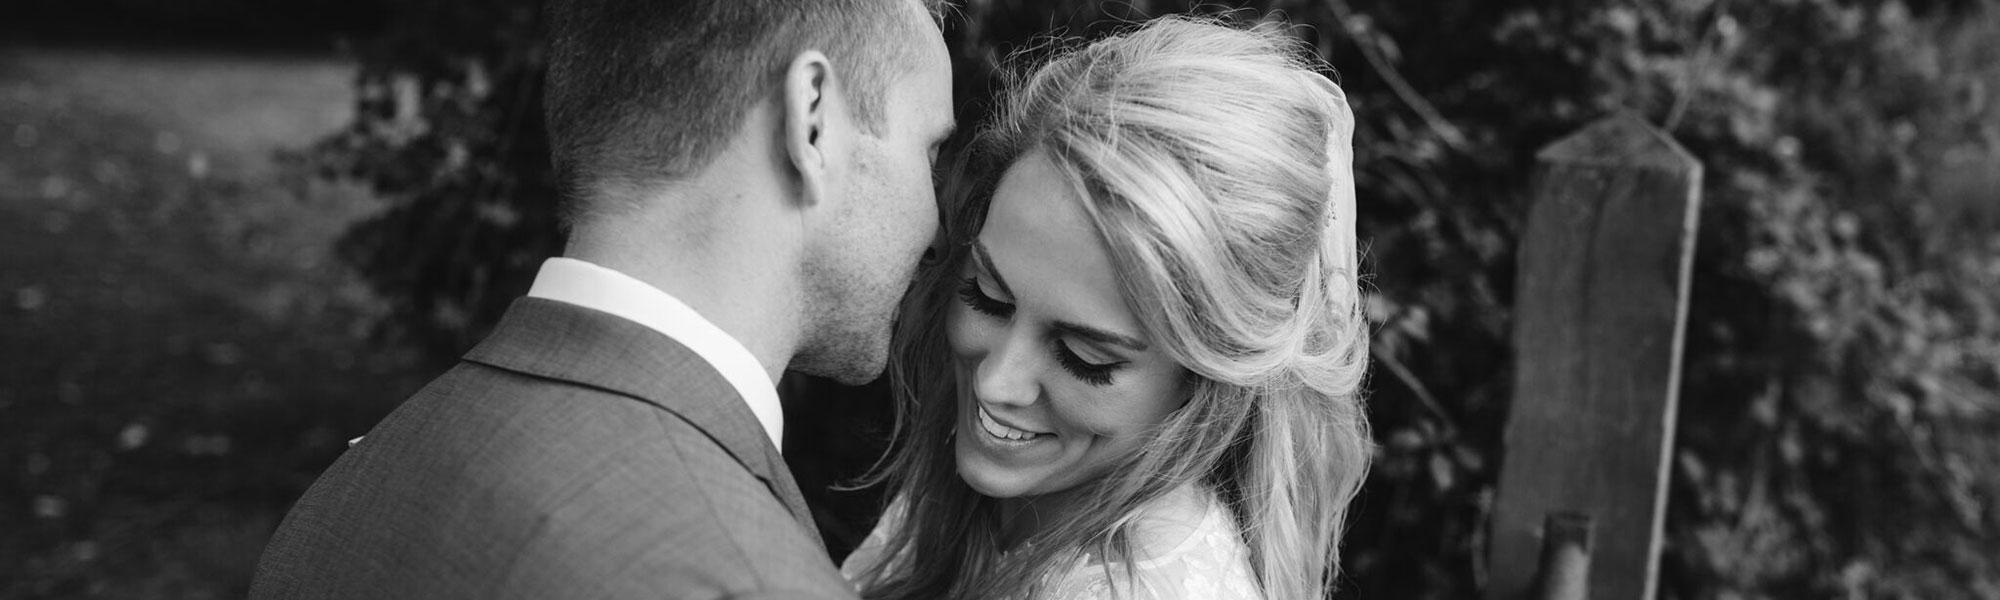 The Face Boss Bridal Wedding Make-up Artist Slider